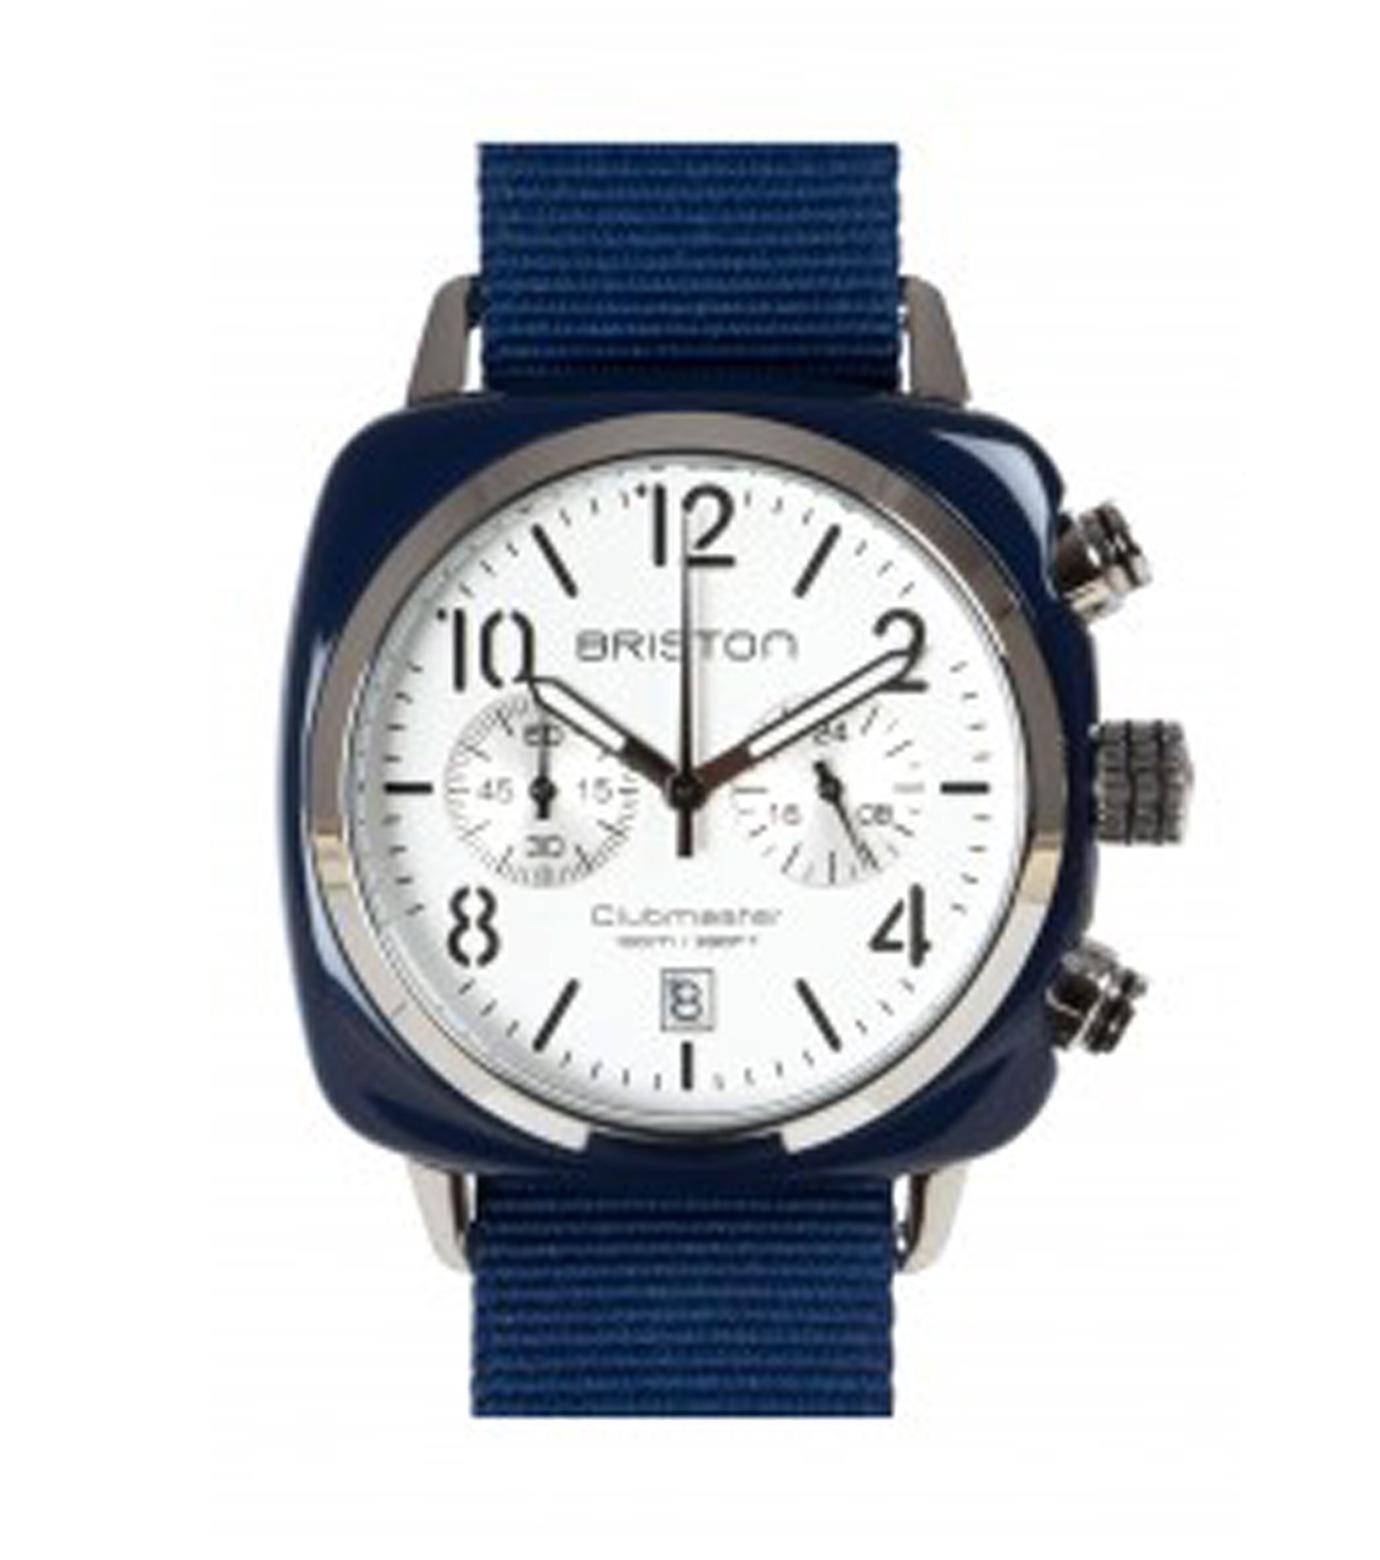 BRISTON(ブリストン)のCHRONO DATE-BLUE(ウォッチ/watch)-DATE-92 拡大詳細画像1